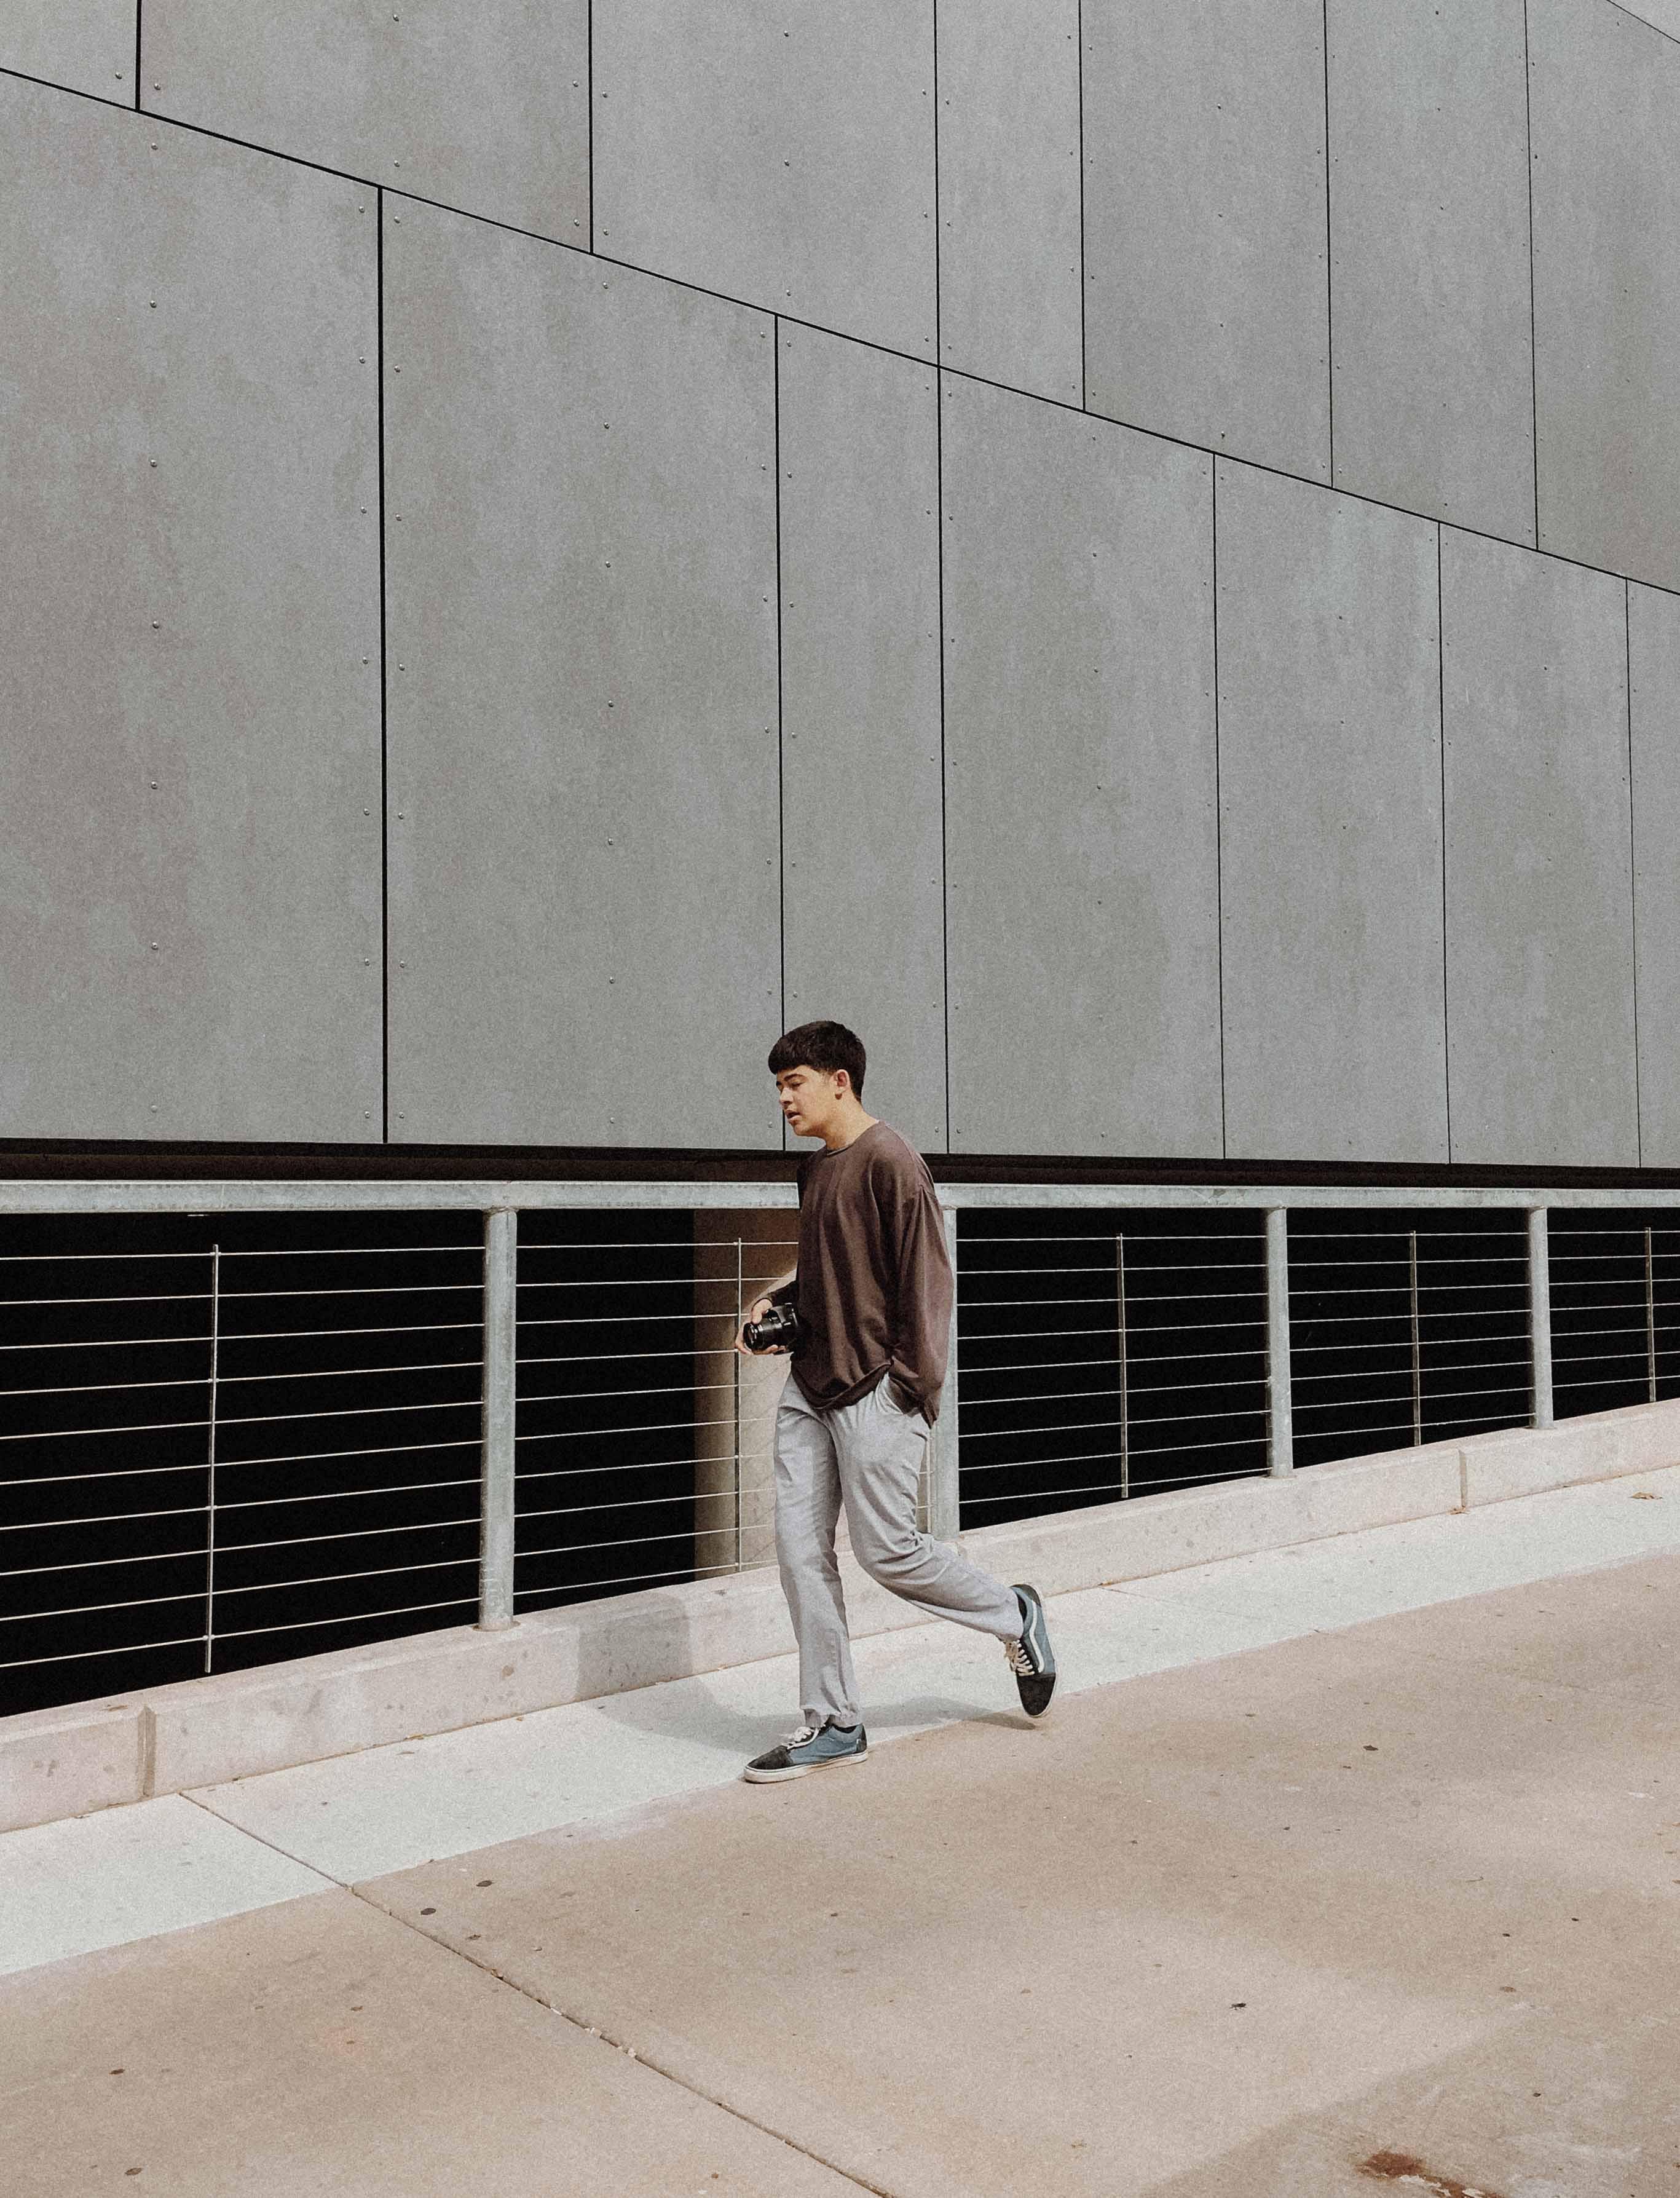 man wearing brown shirt standing near gray wall during daytime